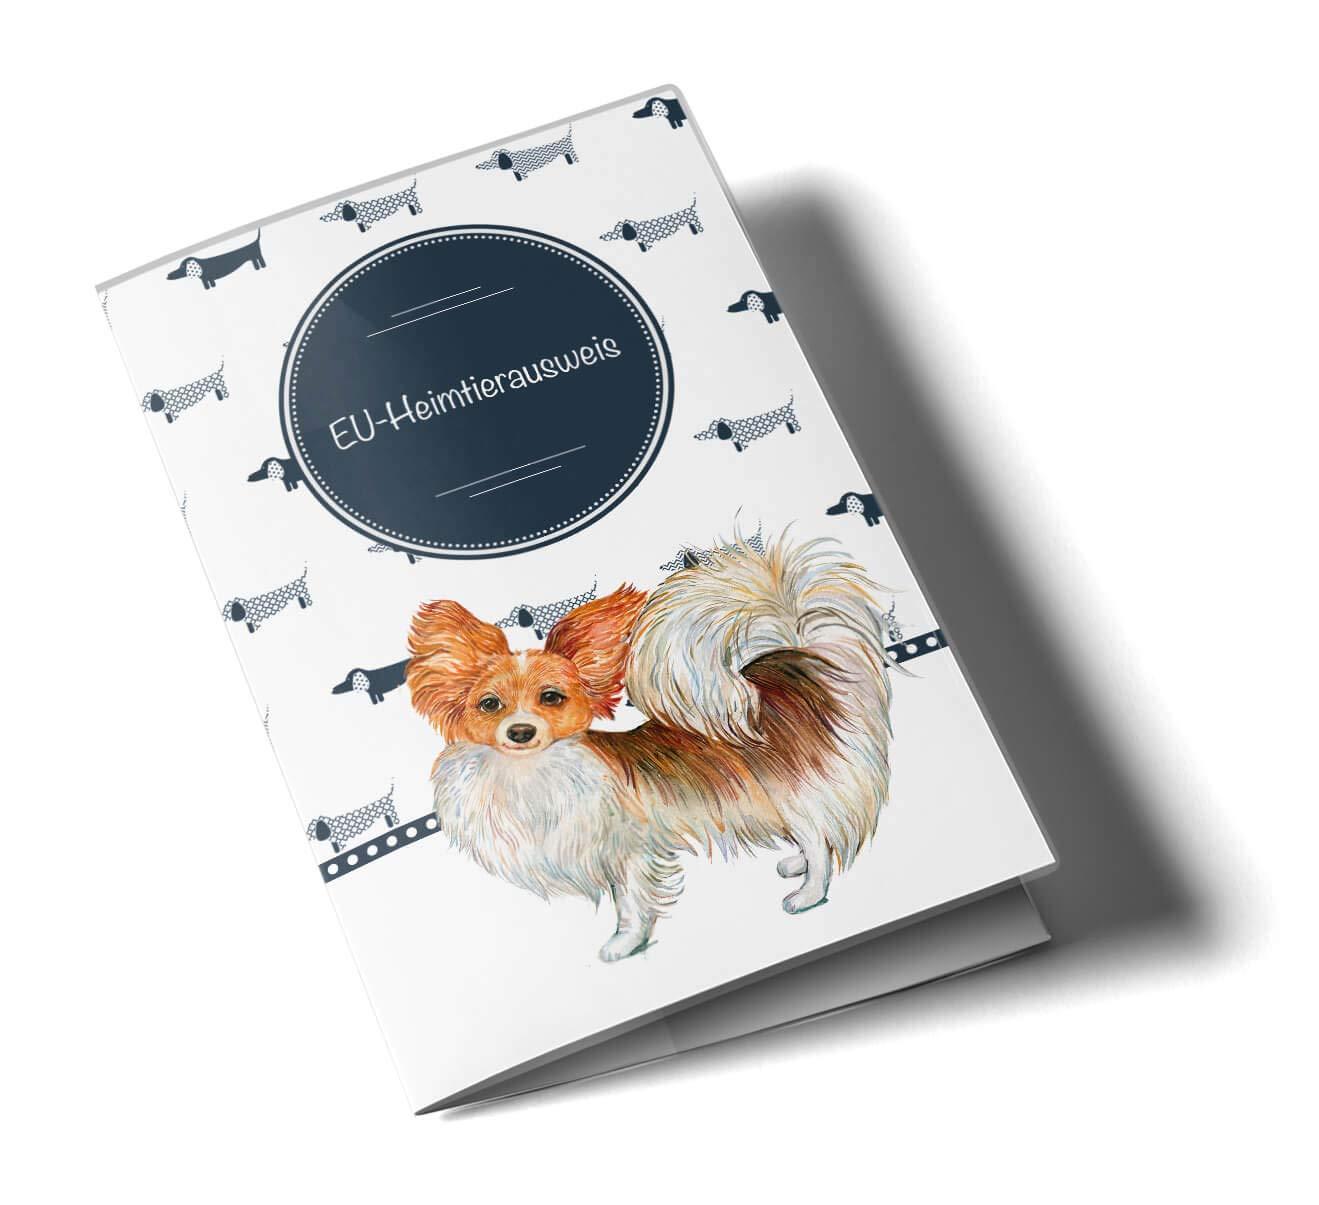 EU-Heimtierausweis H/ülle Taksa Tierausweis Schutzh/ülle sch/öne Geschenkidee personalisierbar mit Namen und Geburtsdatum Dackel, EU-Heimtierausweish/ülle personalisiert